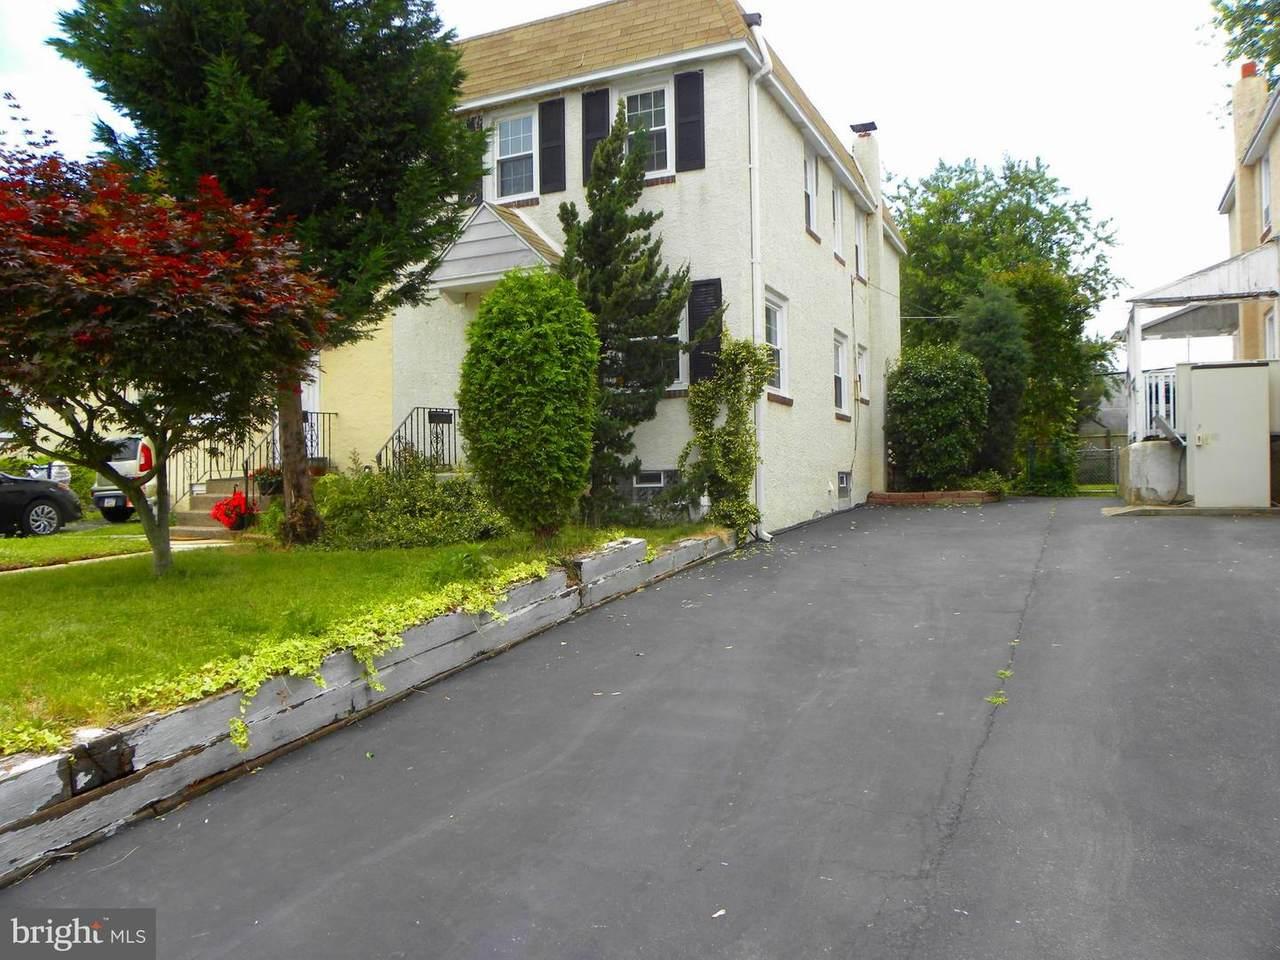 221 Derwood Drive - Photo 1